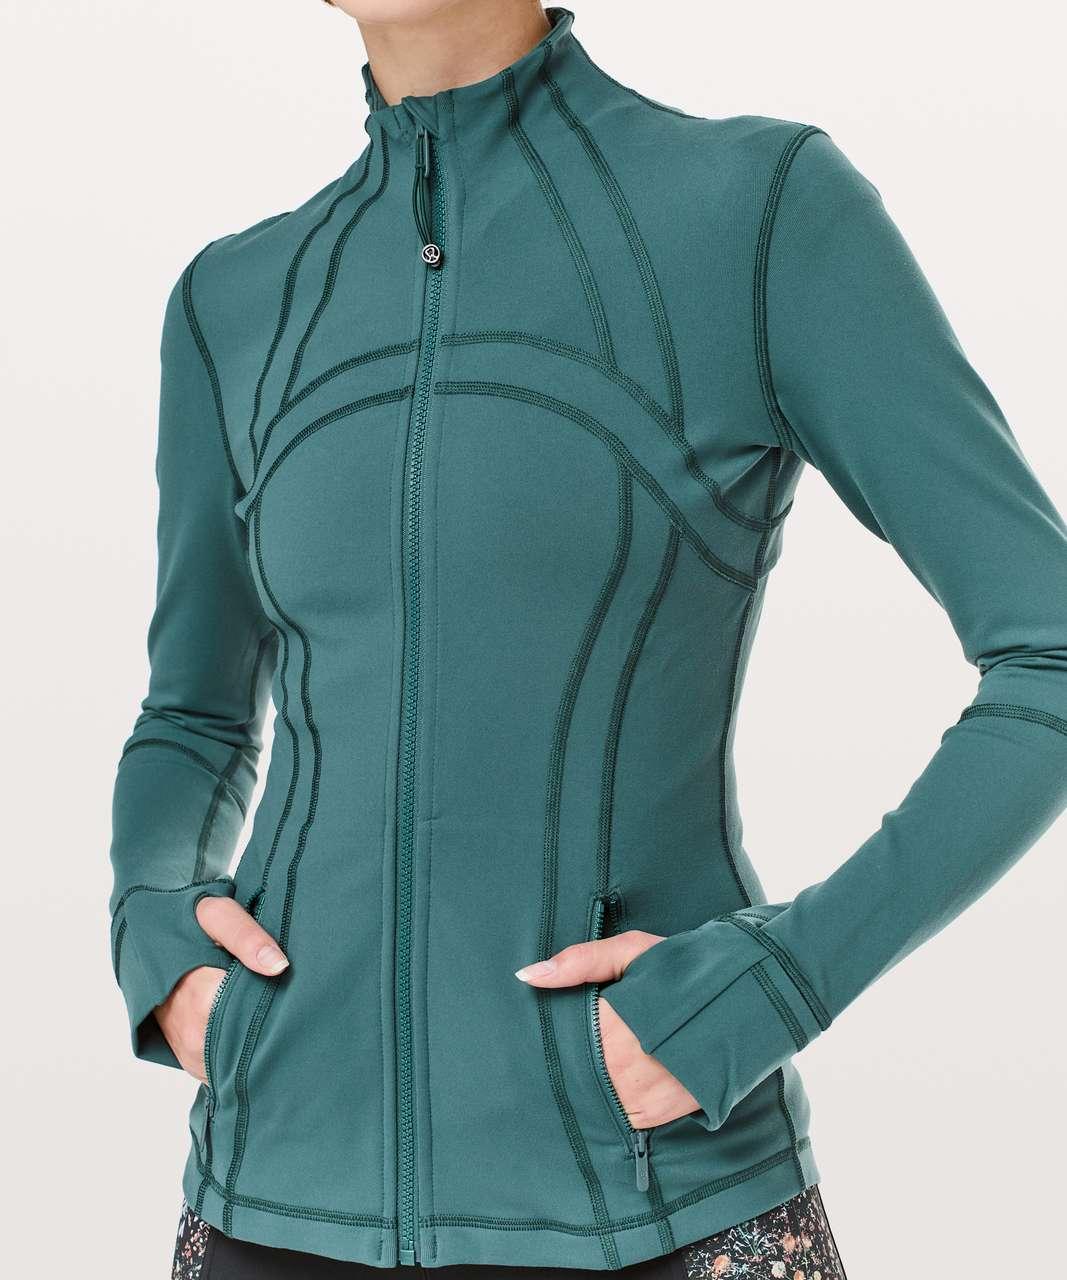 Lululemon Define Jacket - Green Jasper